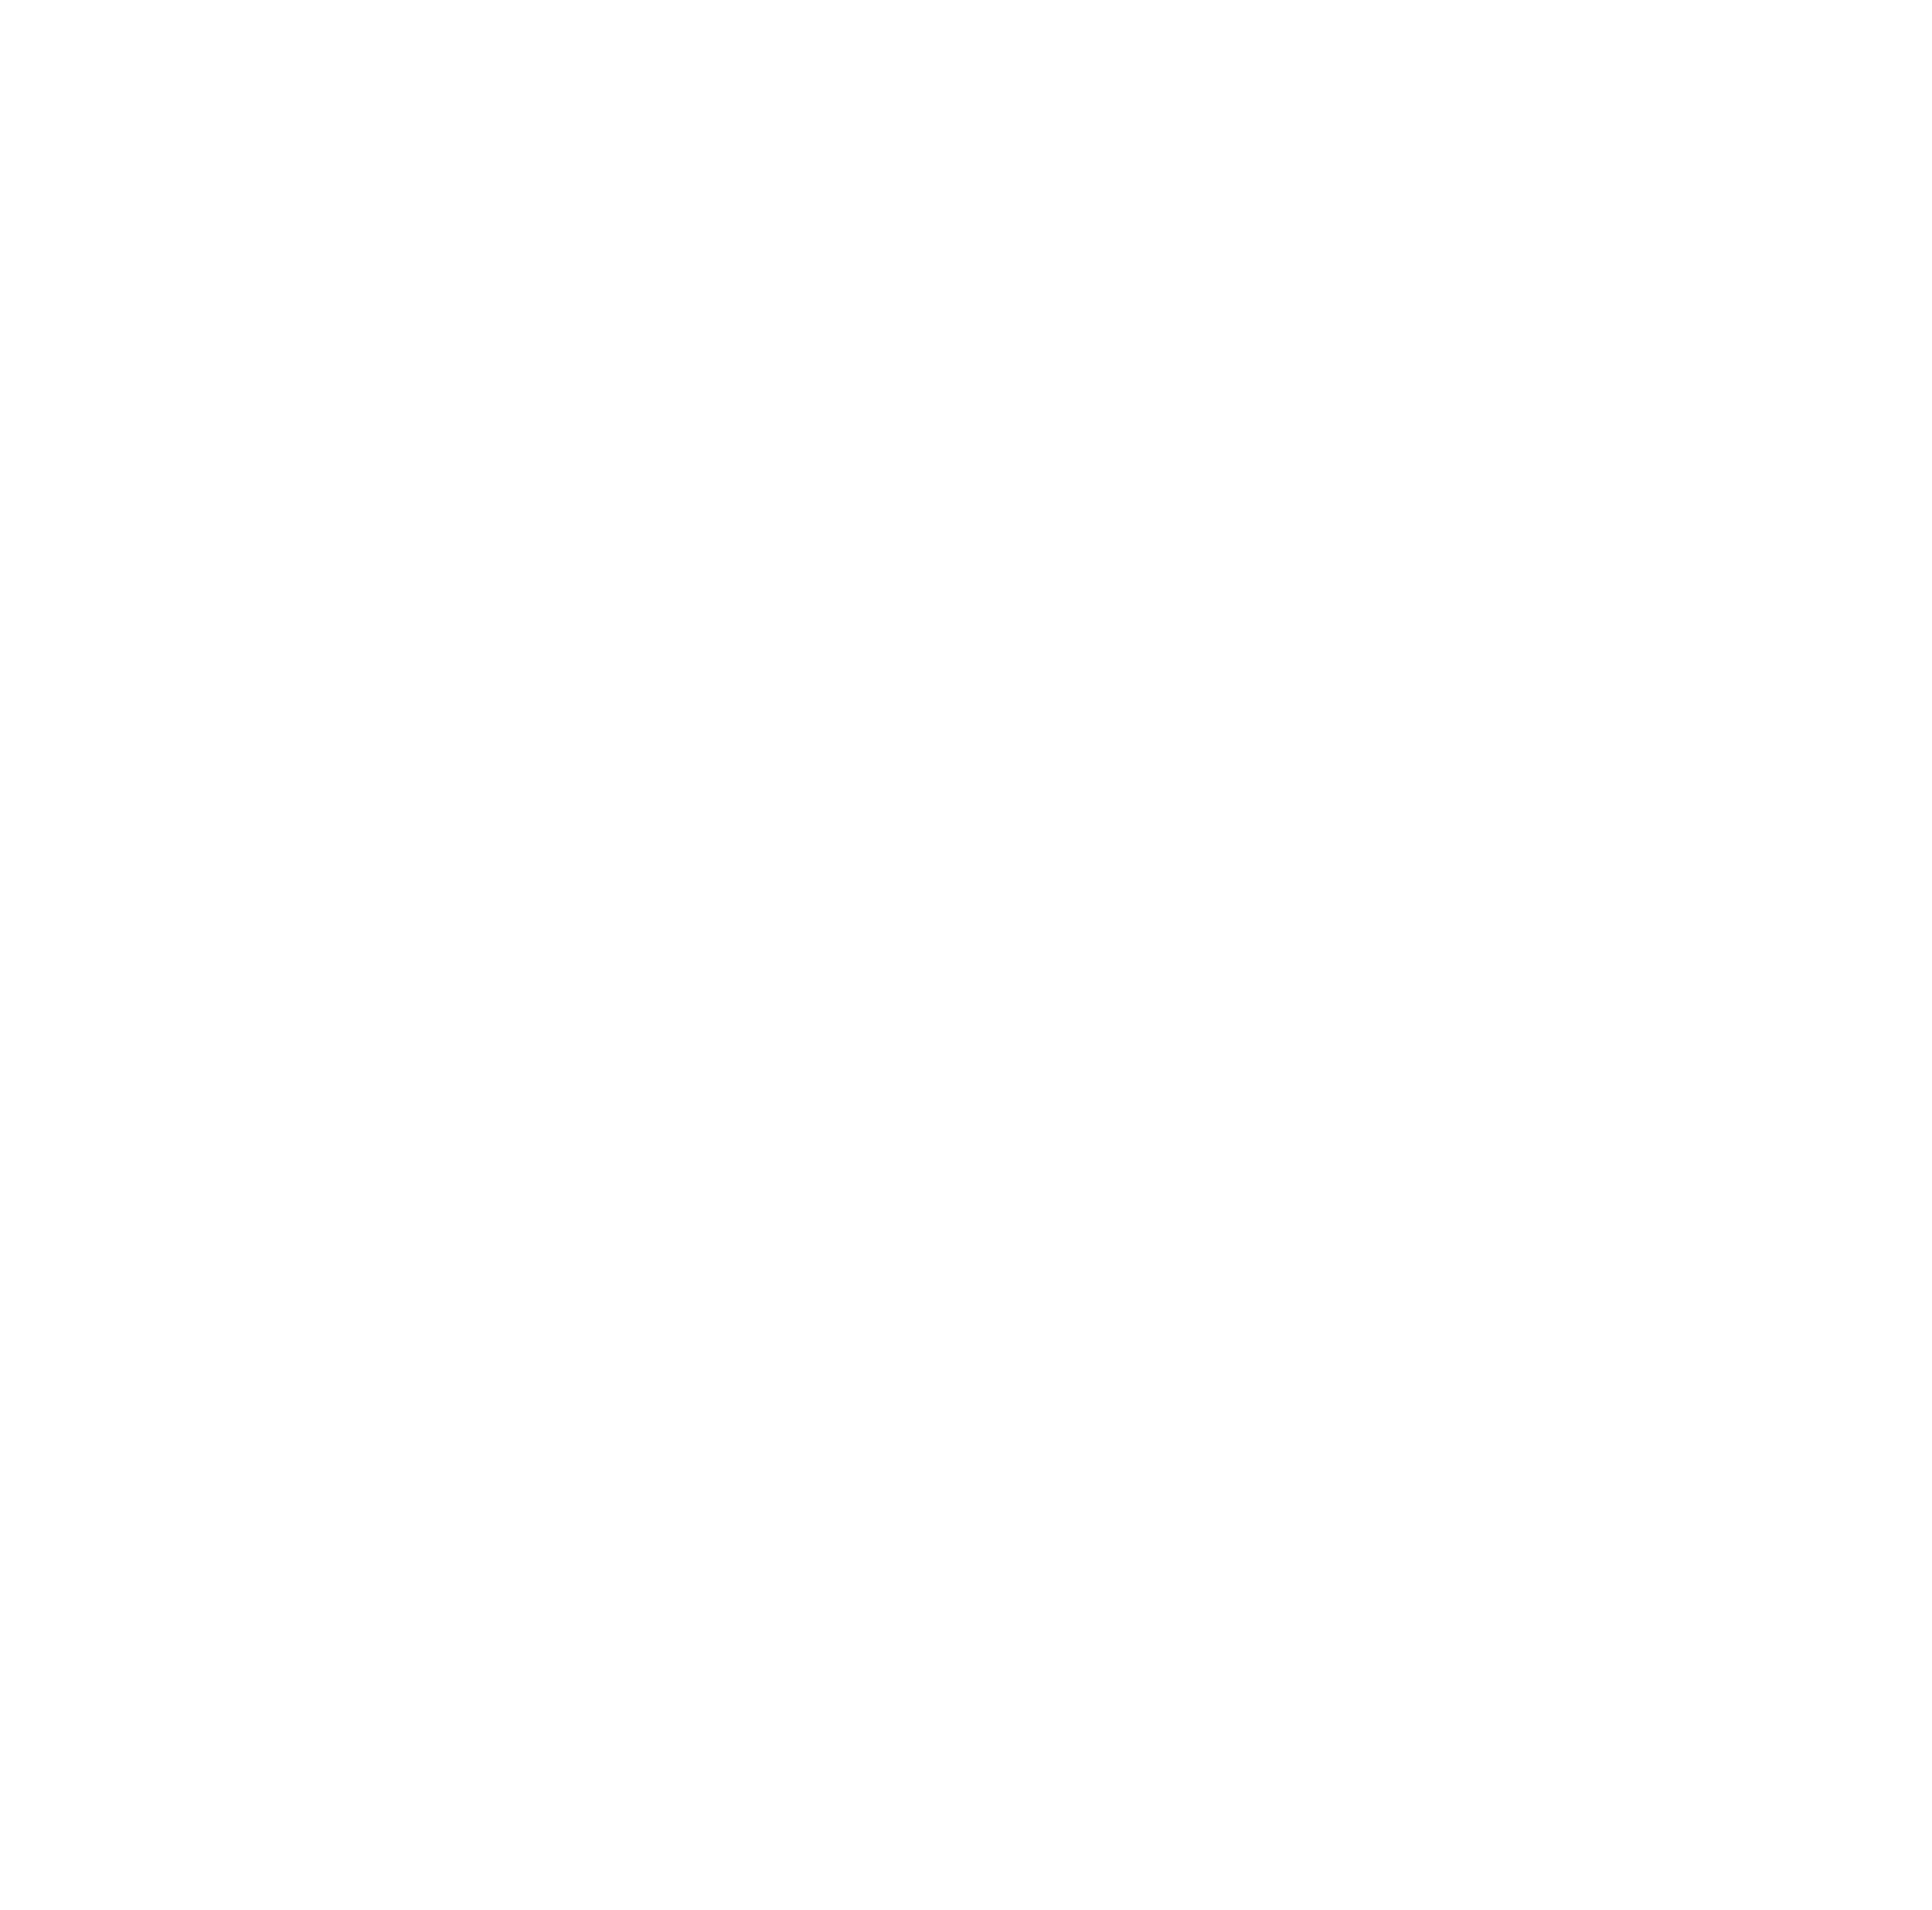 Design professional trucking logo for Loaded Atlas LLC